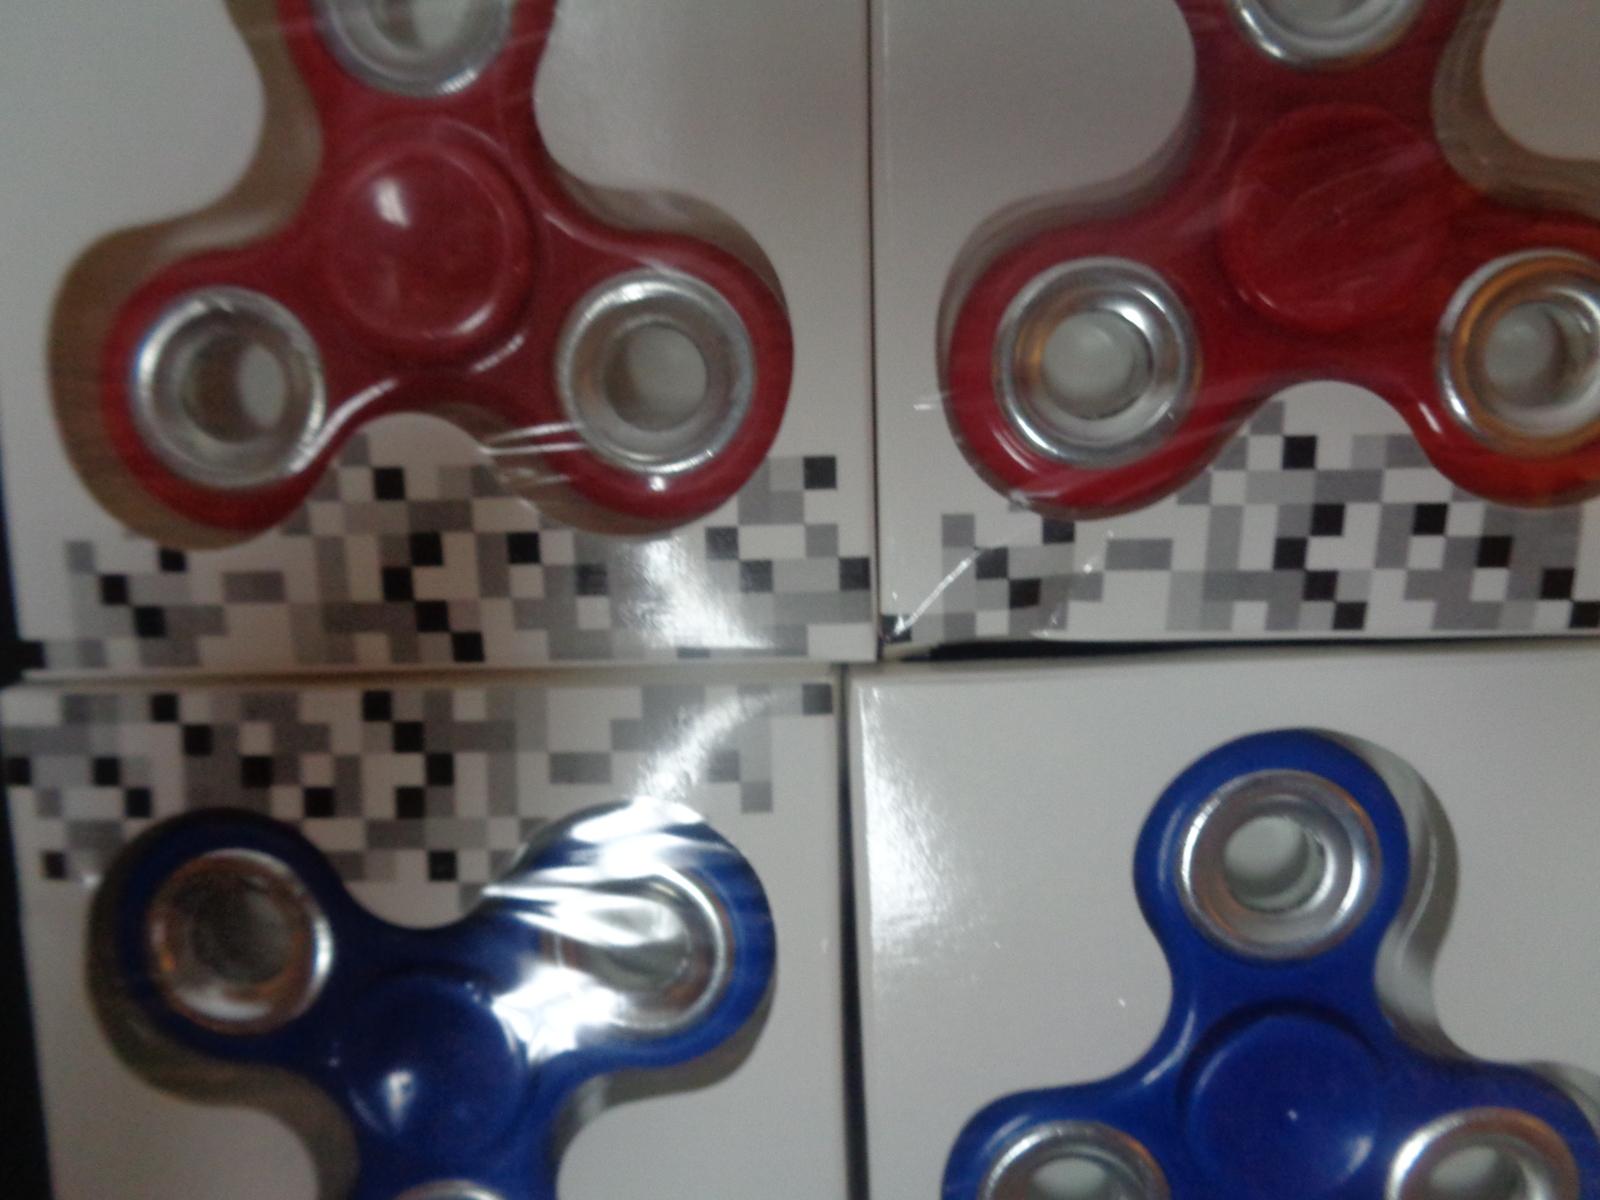 Fidget Spinners Lot of 5 Hand Finger Bar Pocket Desk Focus Toy Red White & Blue